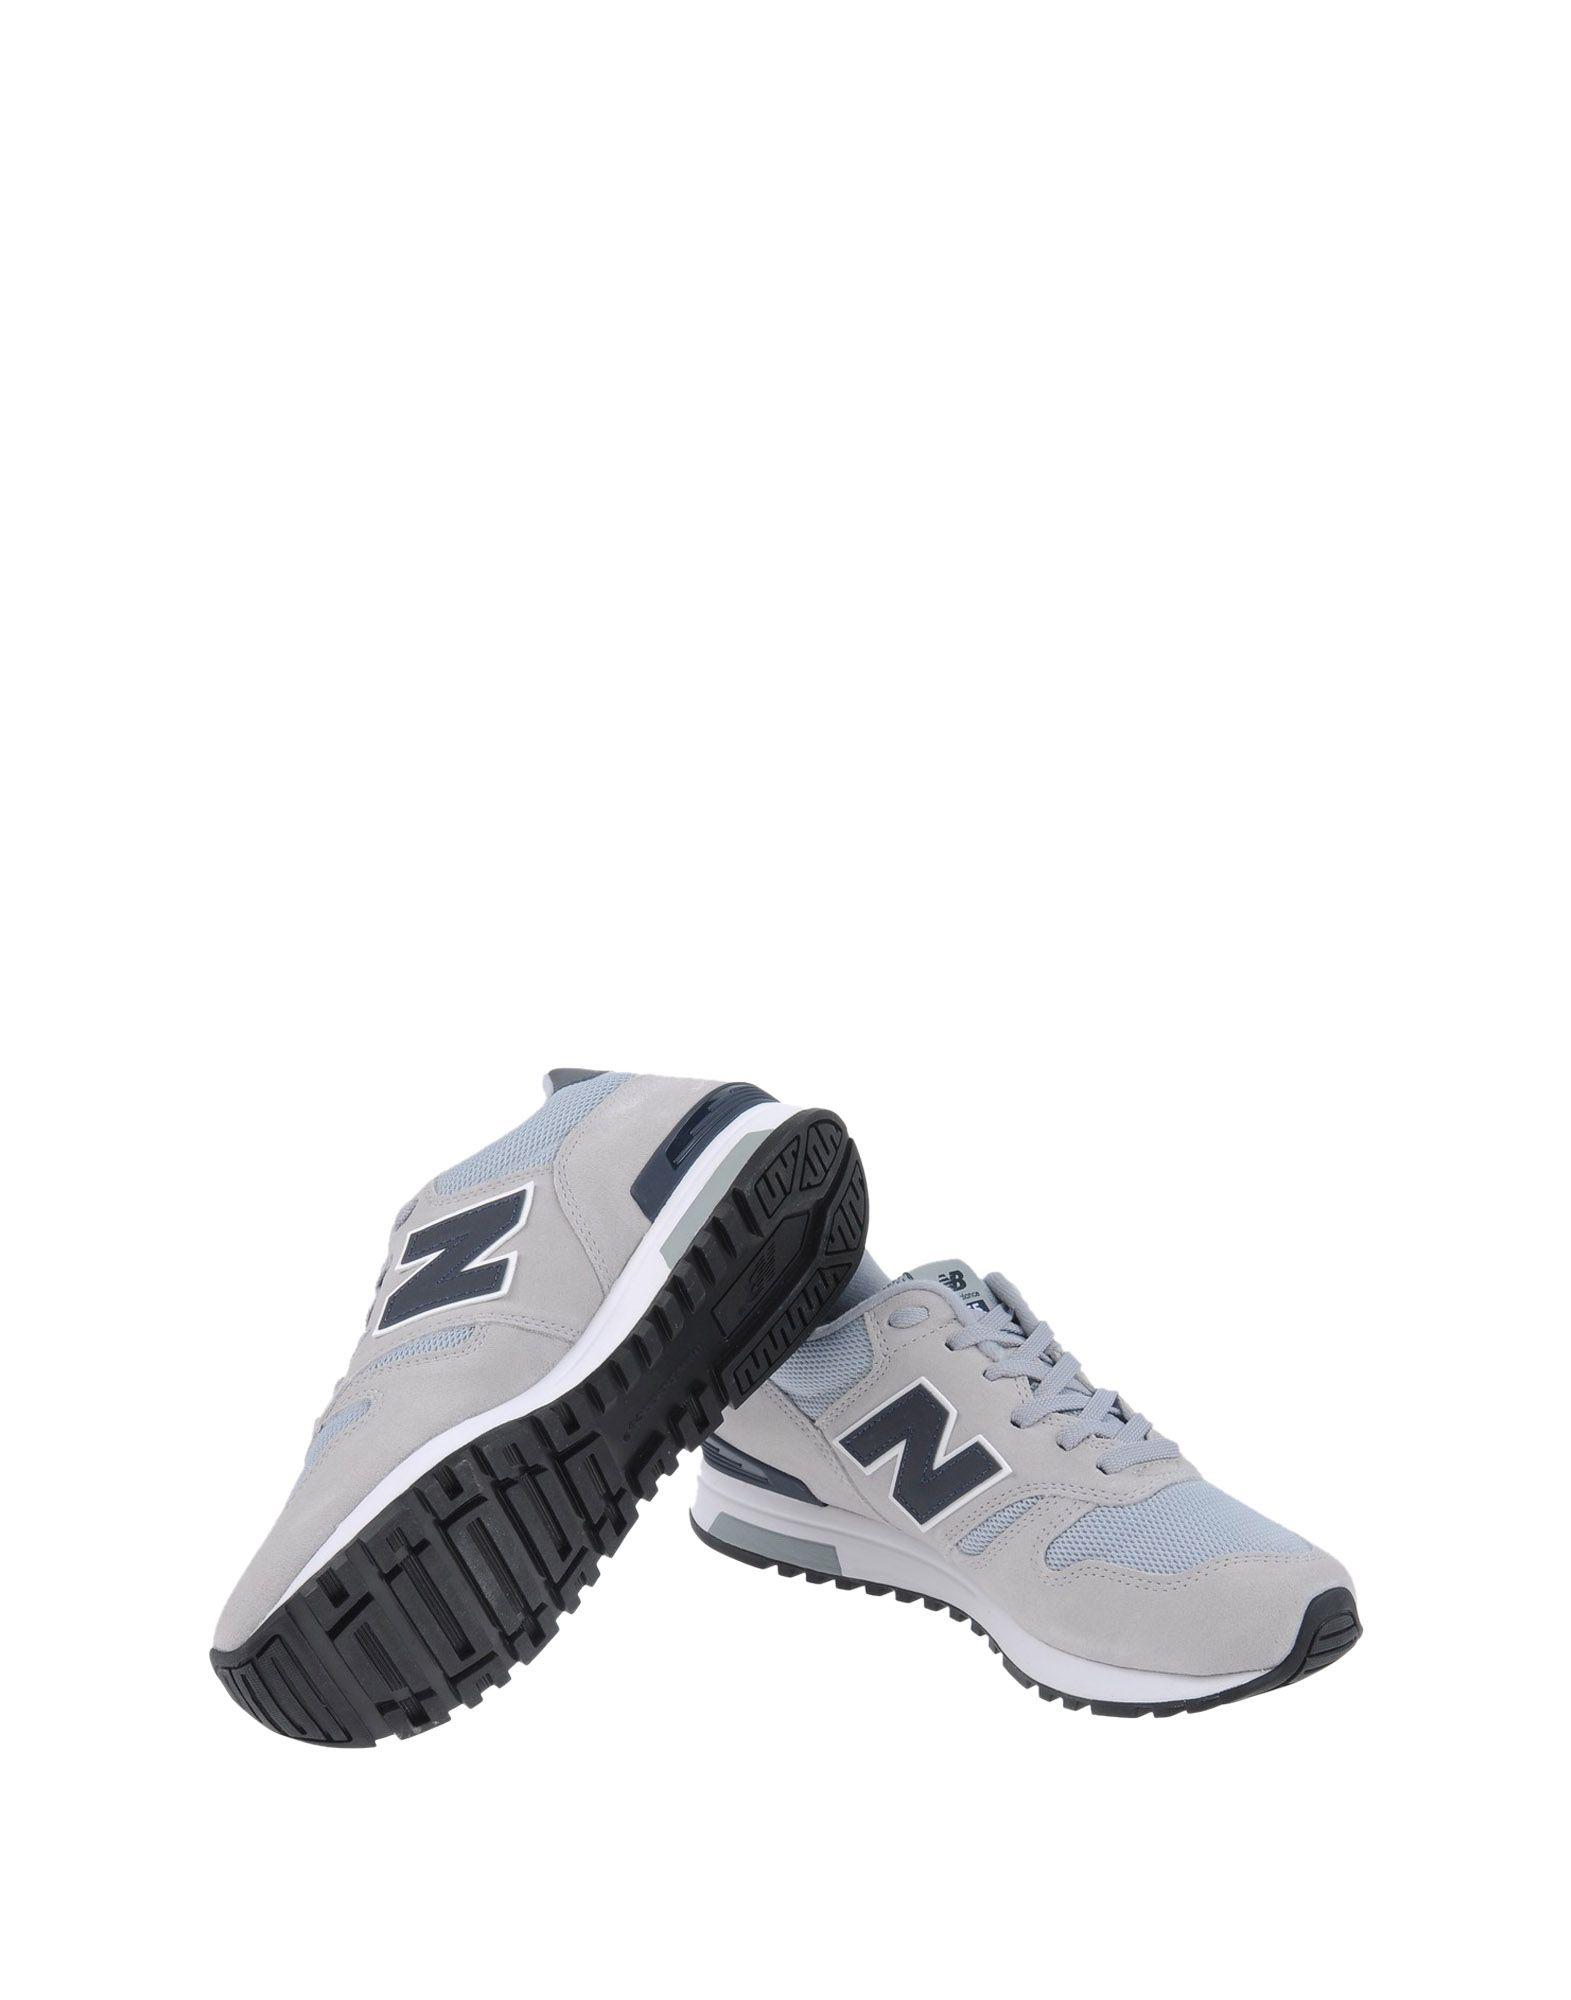 Sneakers New Balance 565 Suede - Mesh - Uomo - 11195718FL